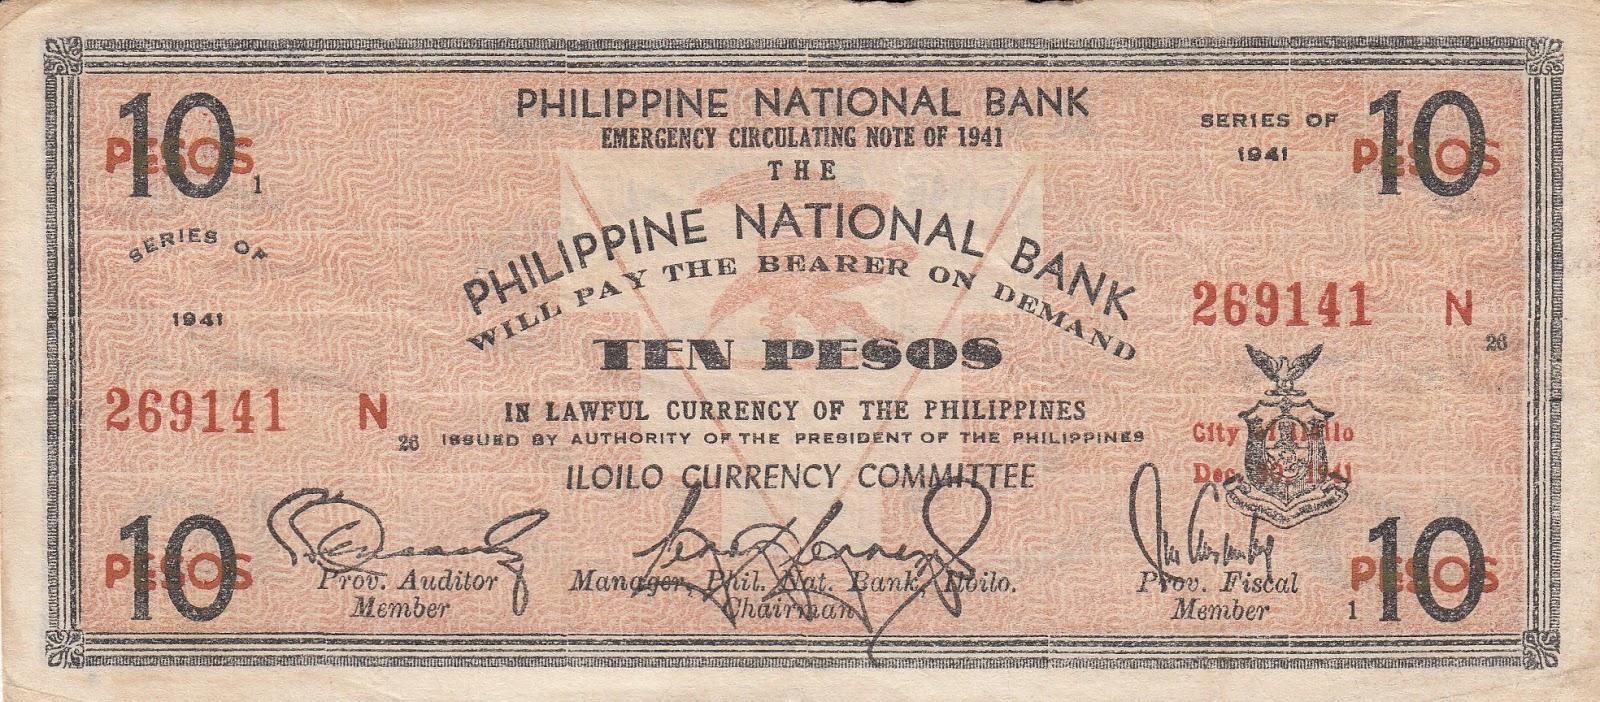 1941 P-S216 Emergency Notes WW II CEBU Circulated Philippines 5 Pesos